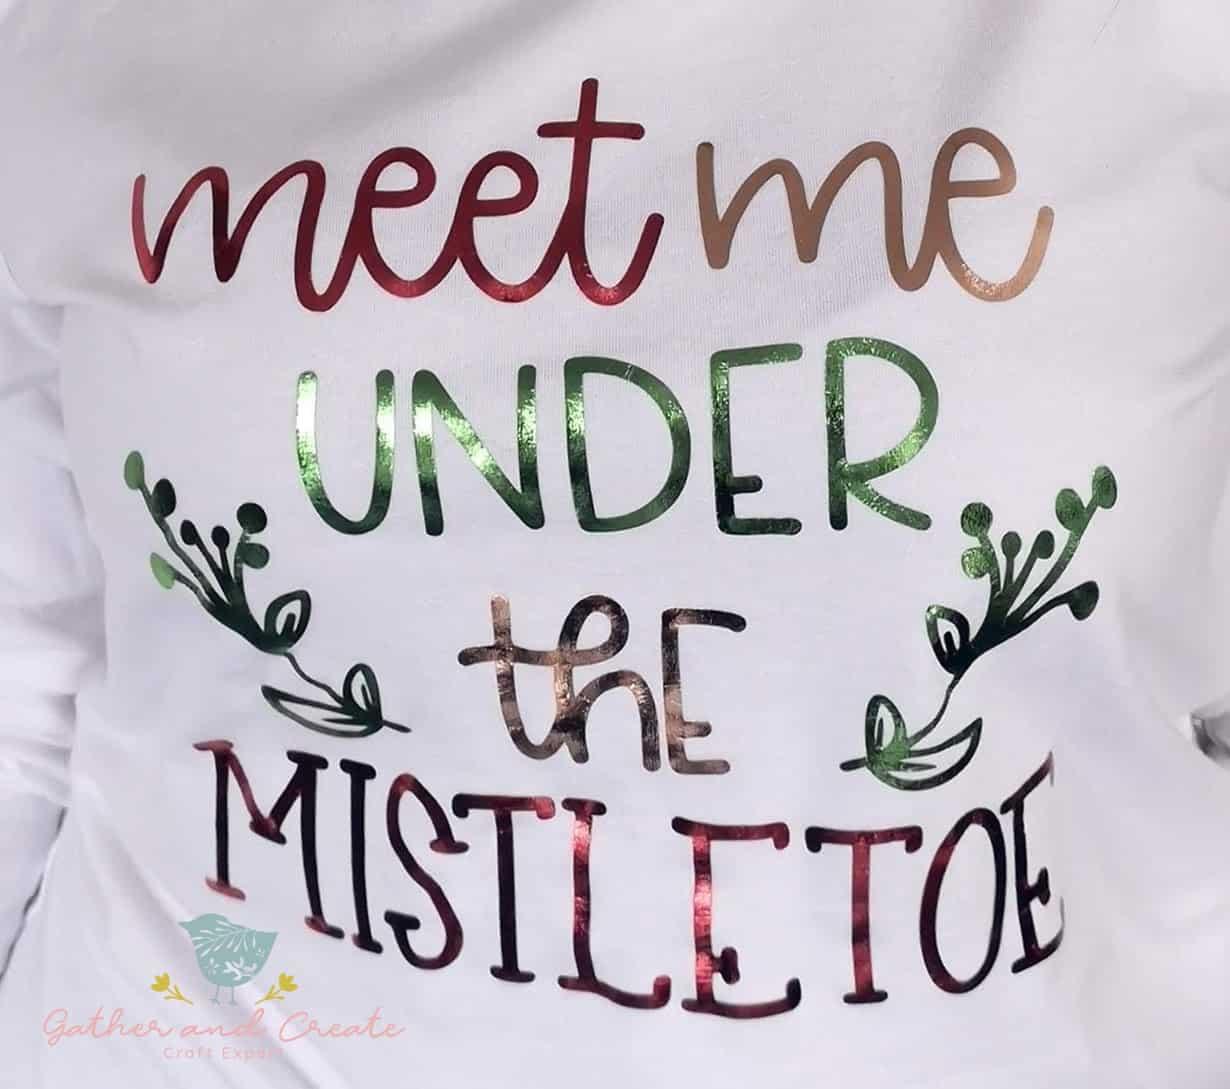 Meet me under the mistletoe – DIY Christmas shirt.